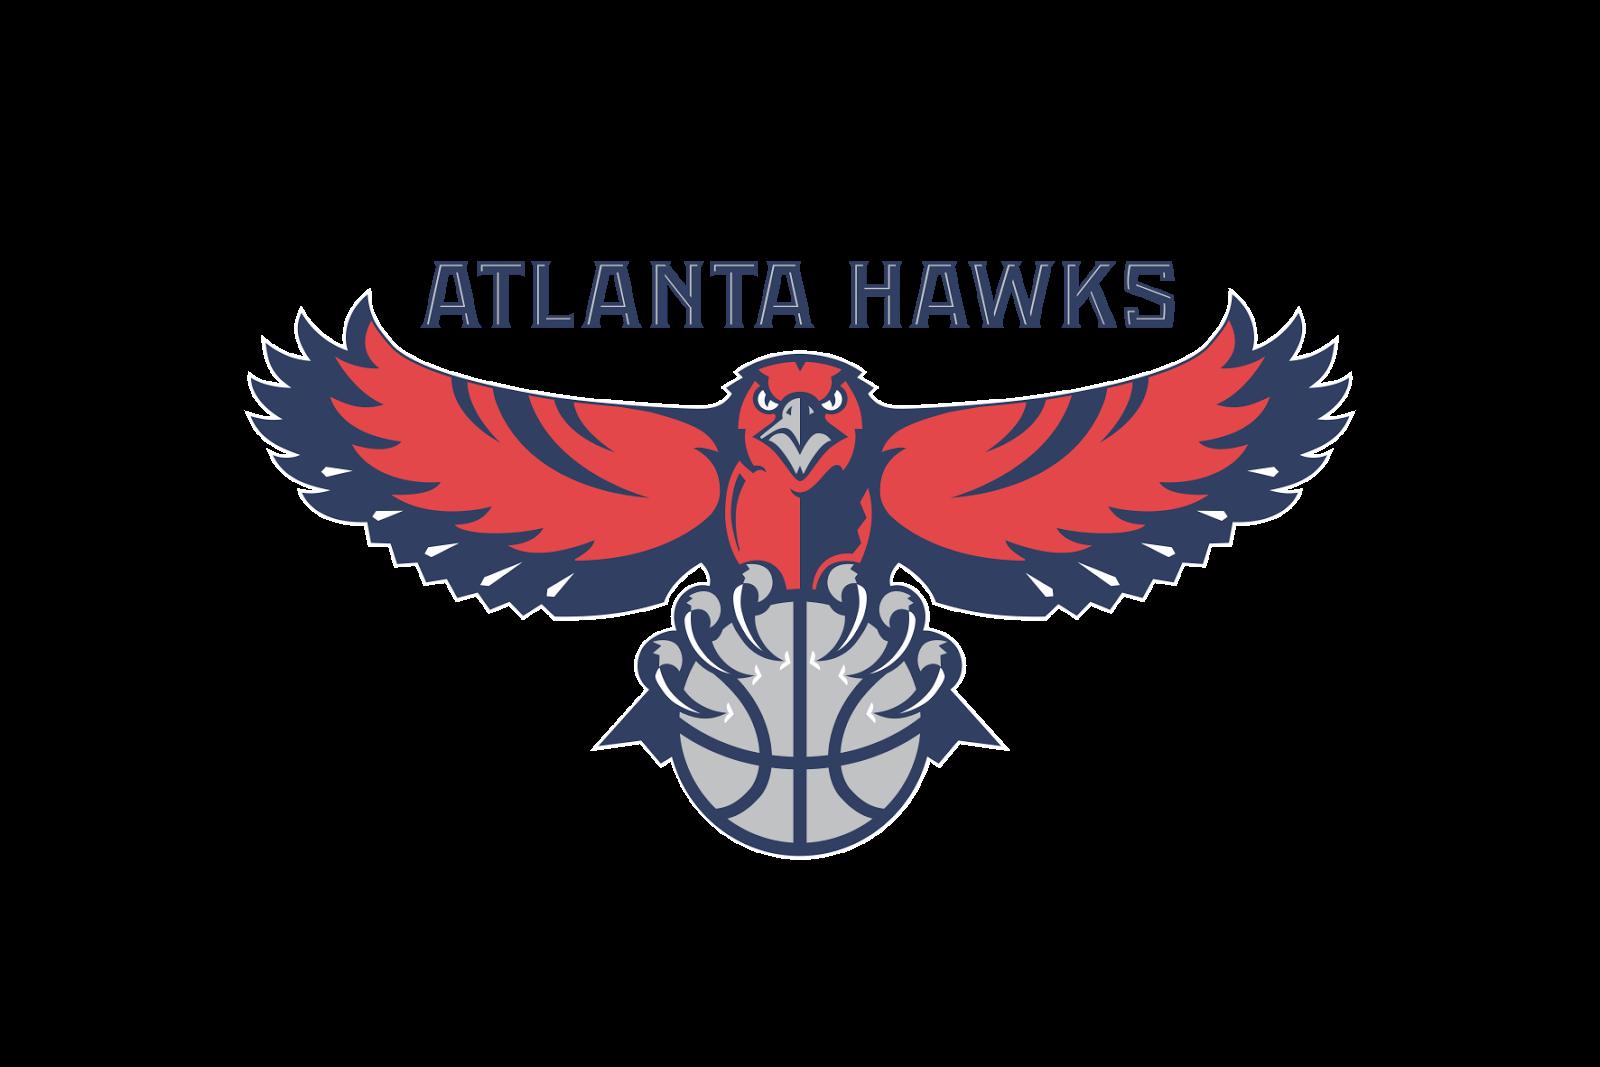 Atlanta hawks logo logo share atlanta hawks logo buycottarizona